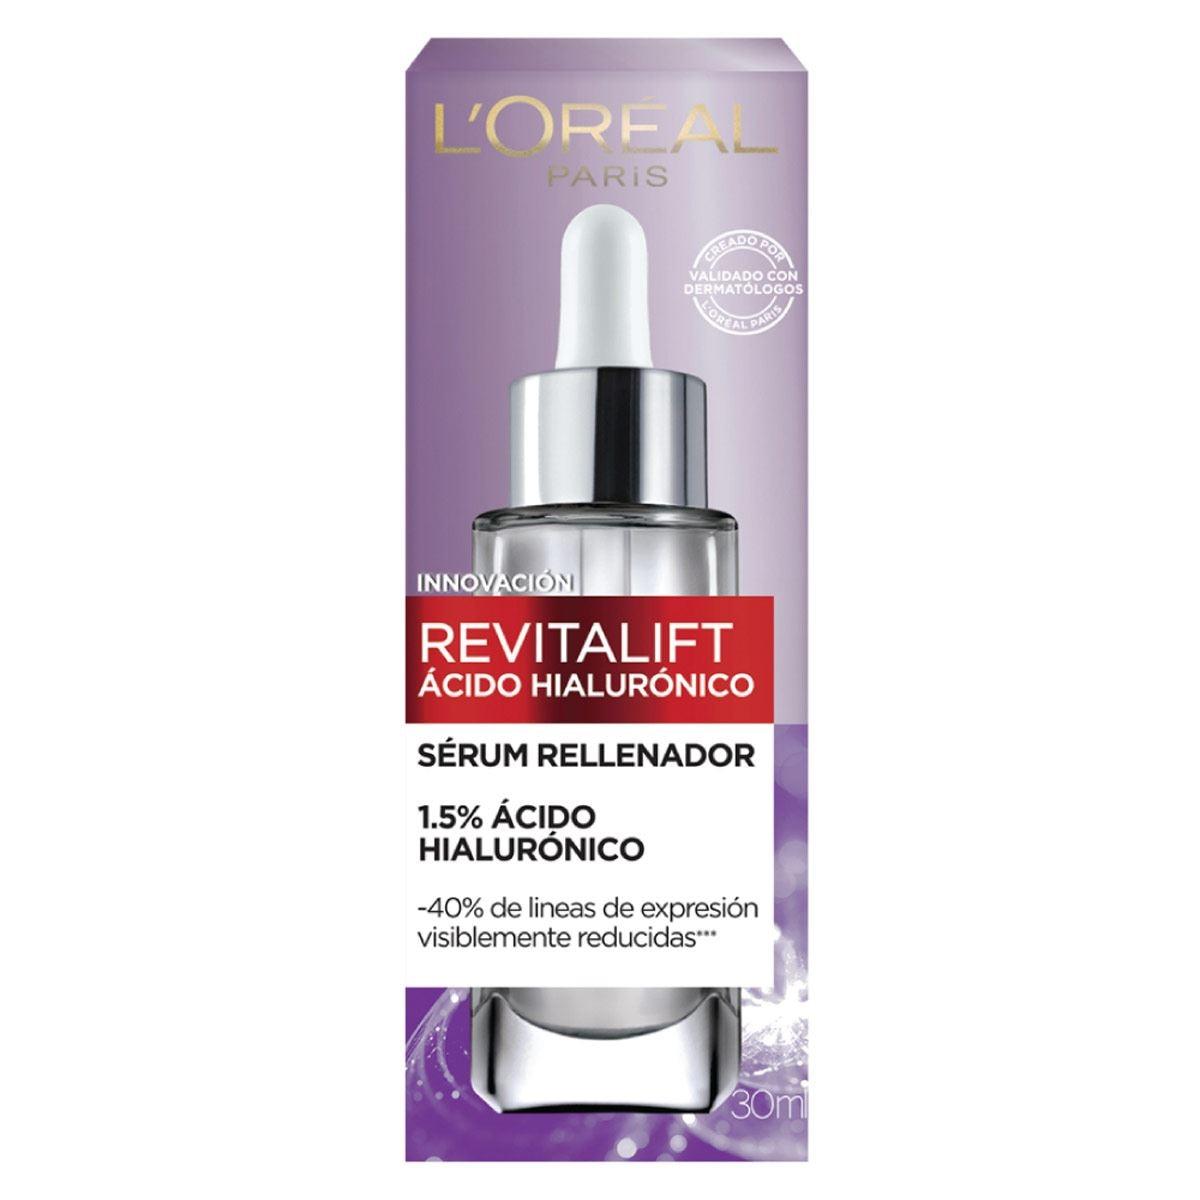 Serum facial anti arrugas Ácido Hialurónico Revitalift L'Oréal Paris